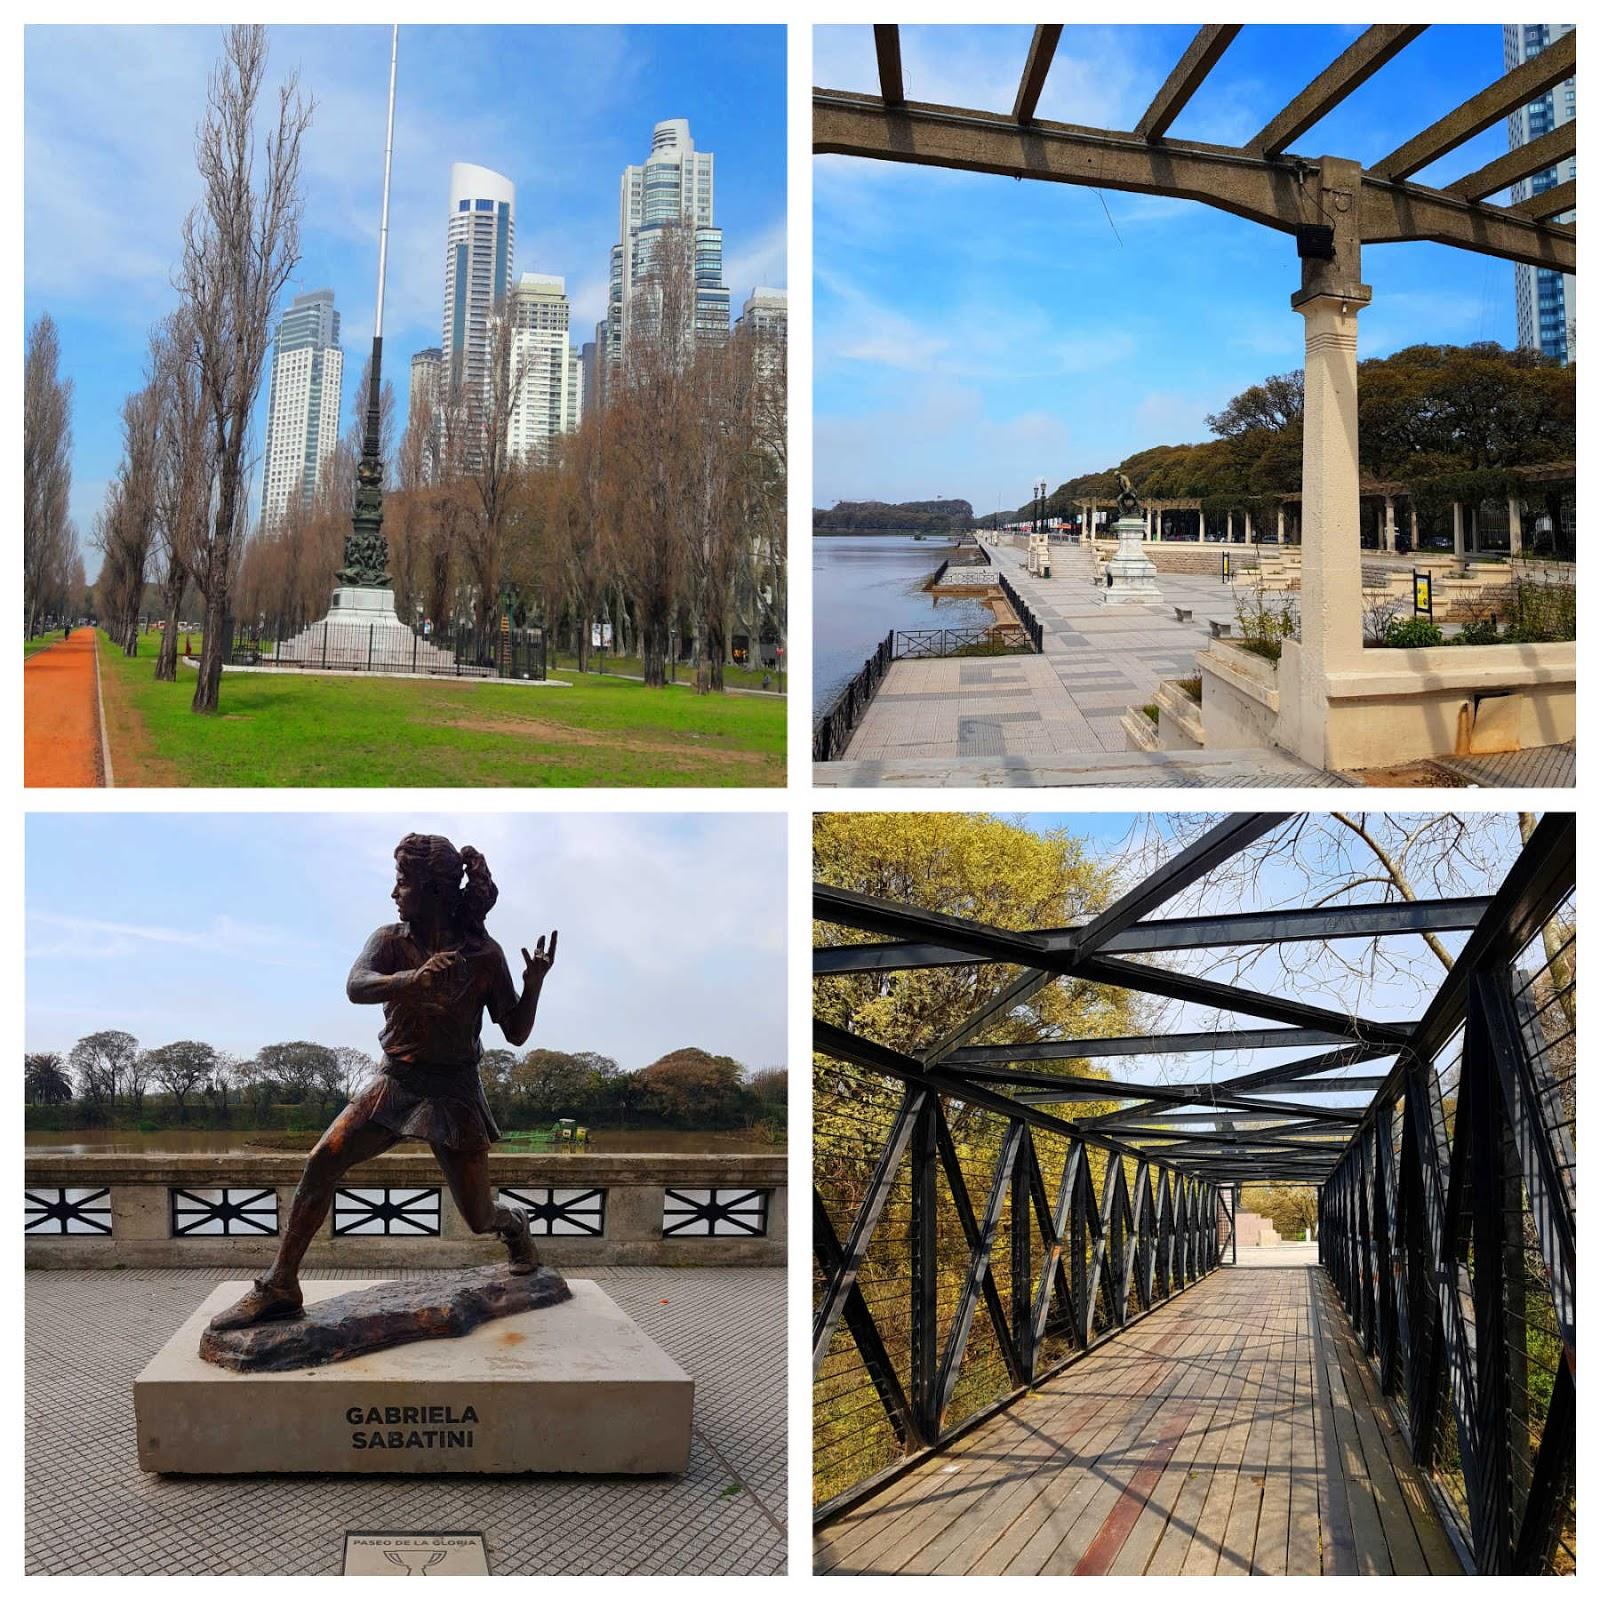 Parque Costanera Sur em Buenos Aires.